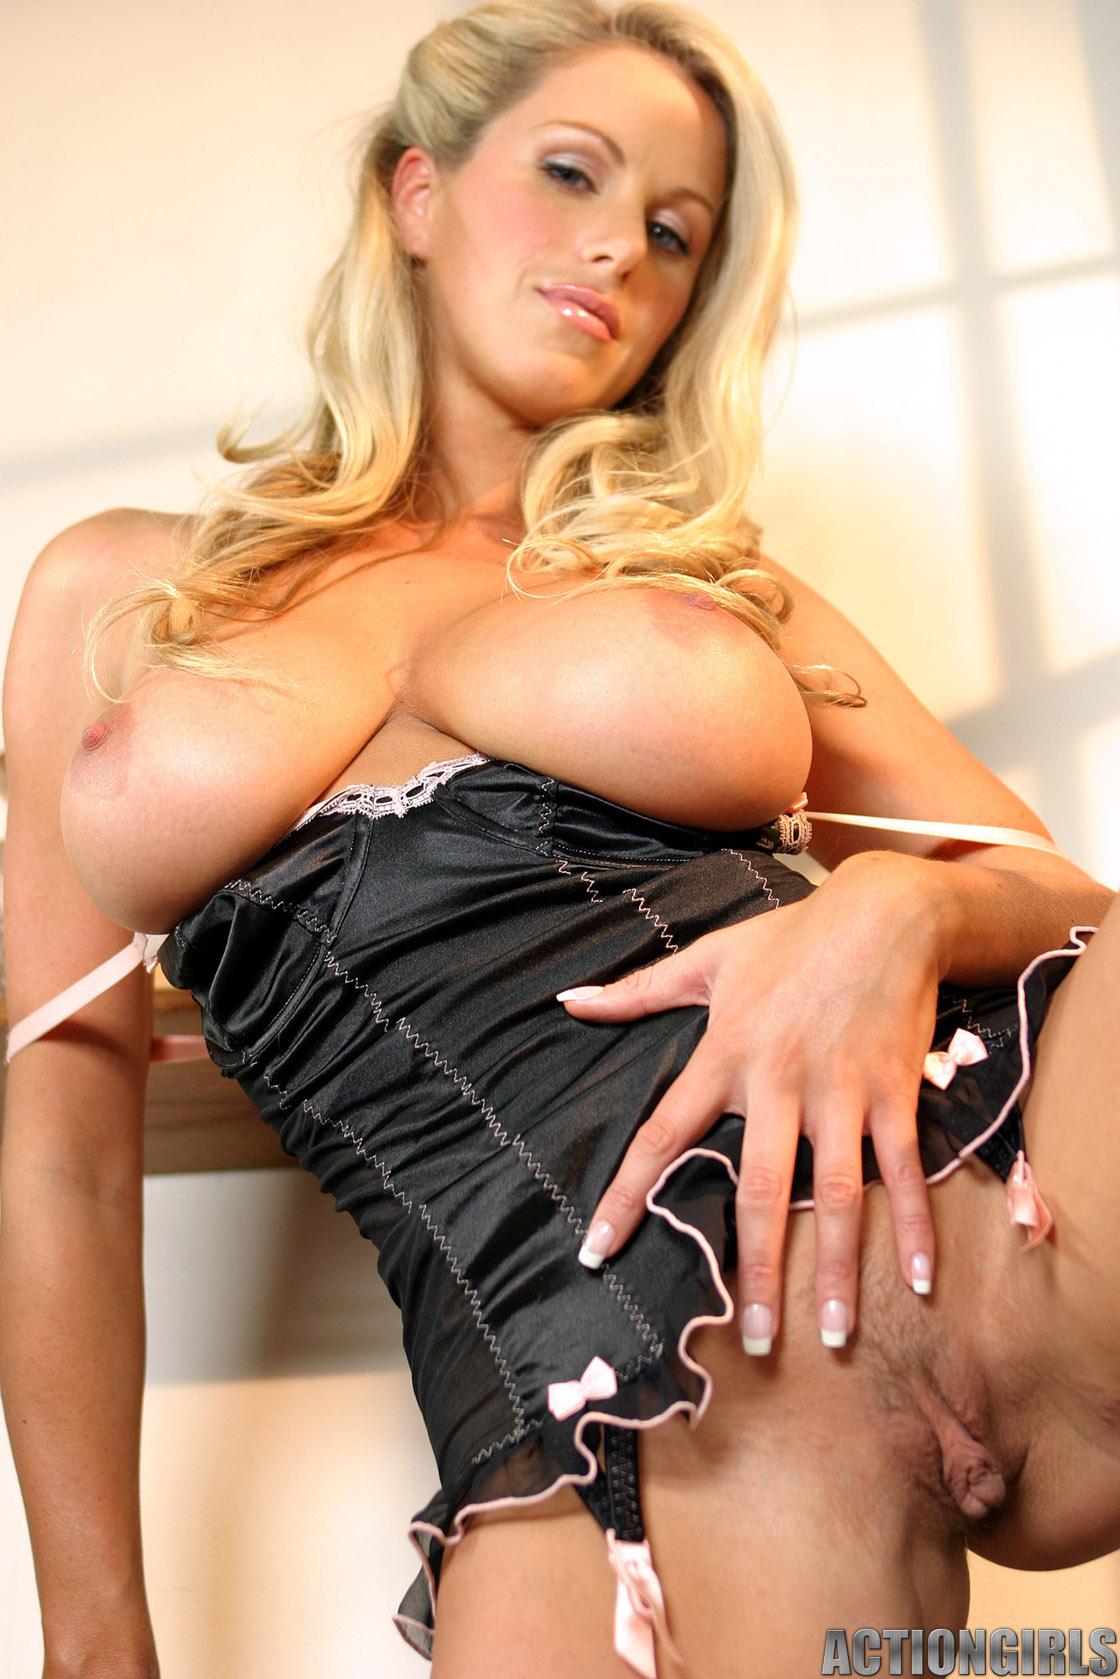 Erica shemale bareback